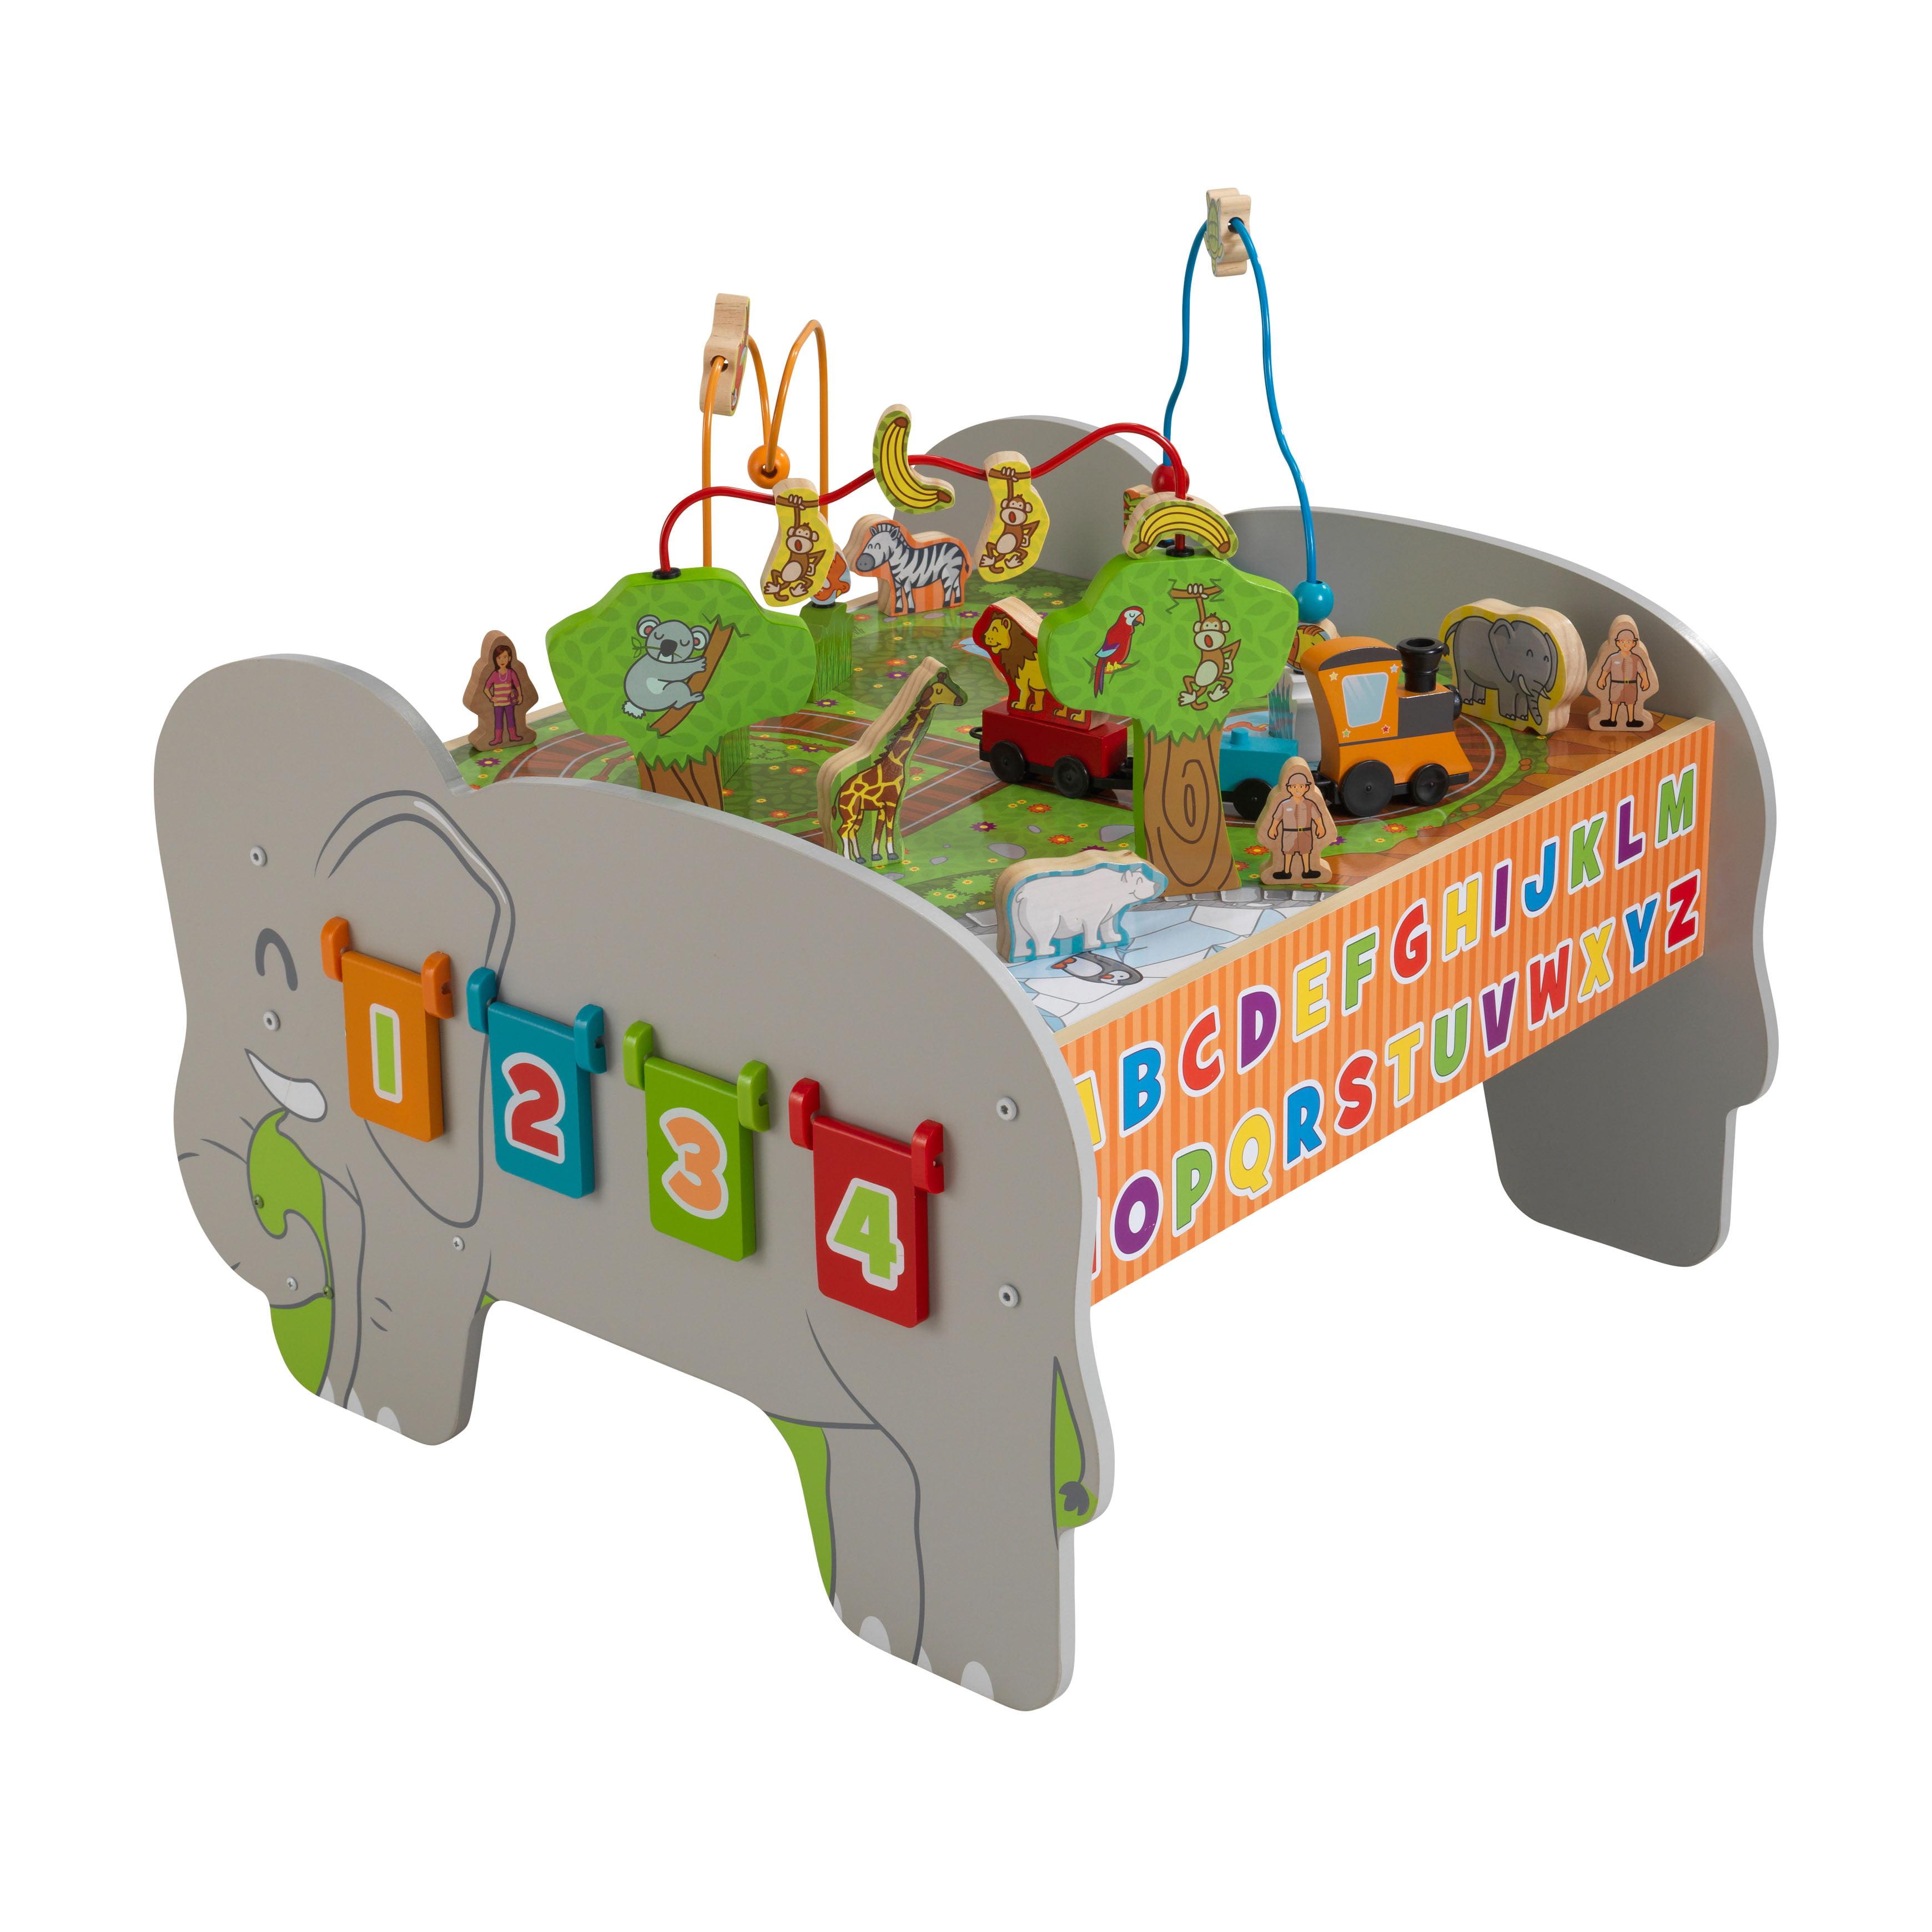 KidKraft Toddler Activity Station by KidKraft